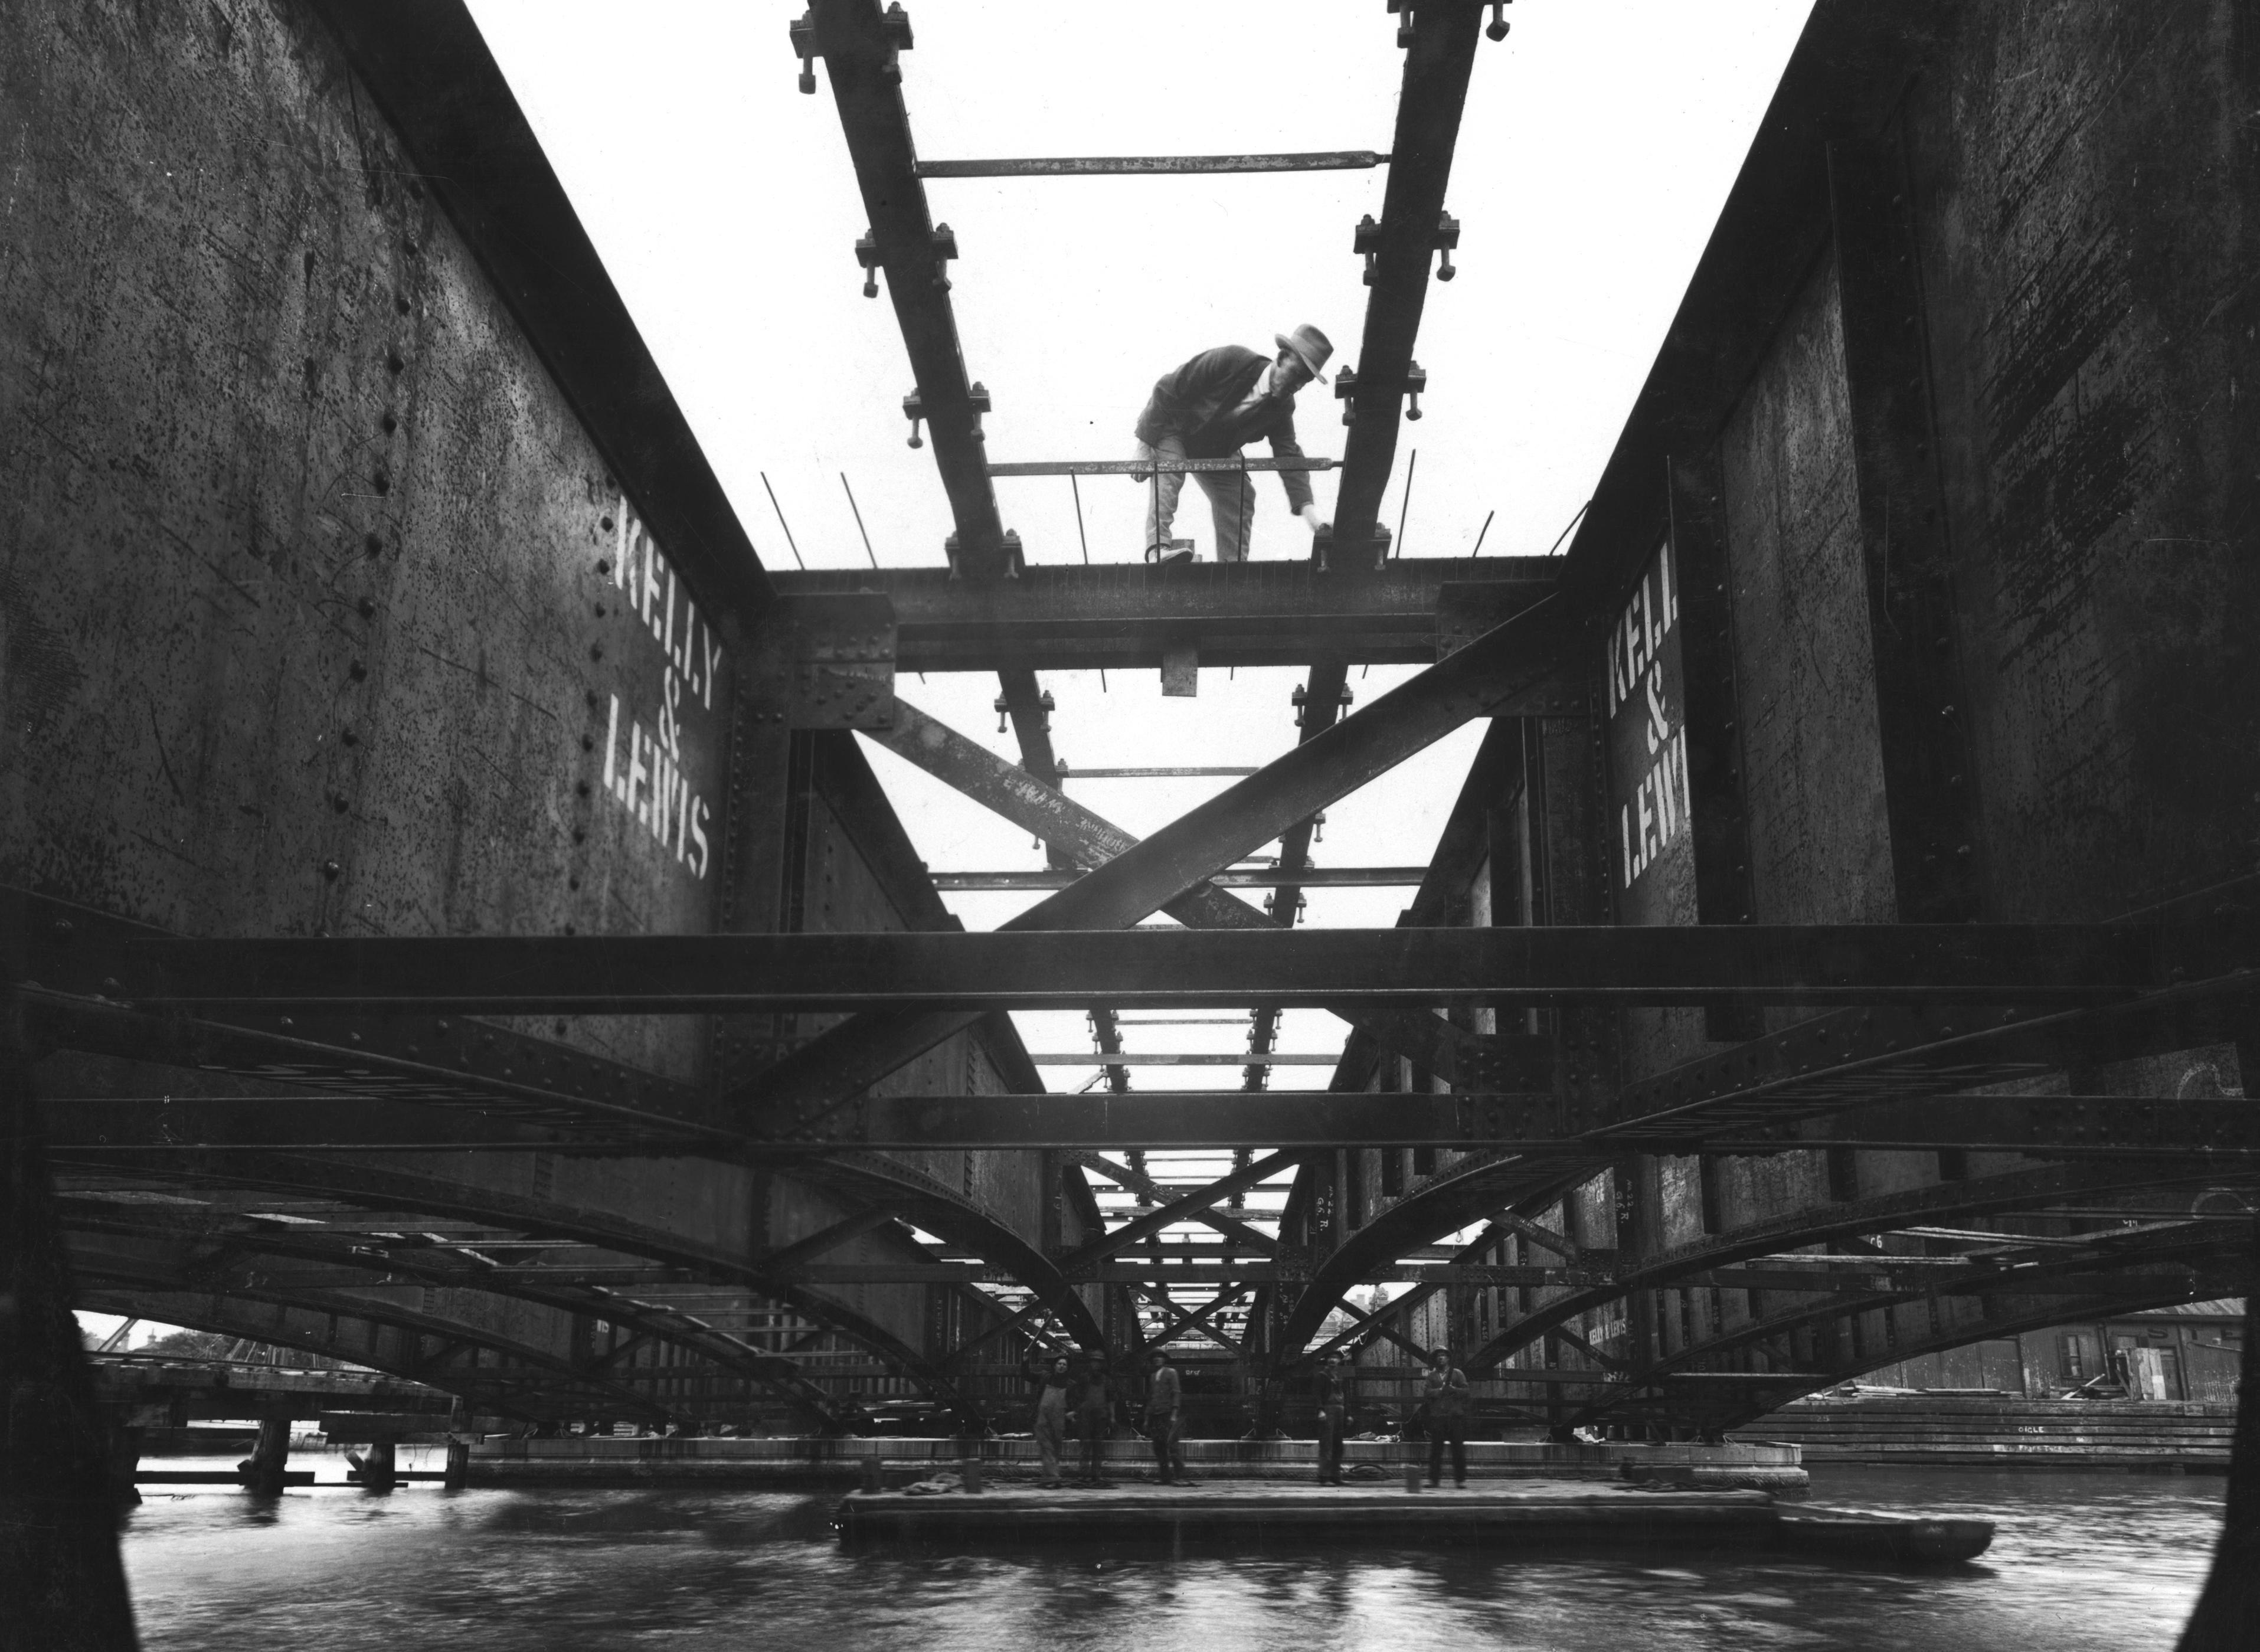 Construction of Spencer Street bridge over Yarra River in 1929-30